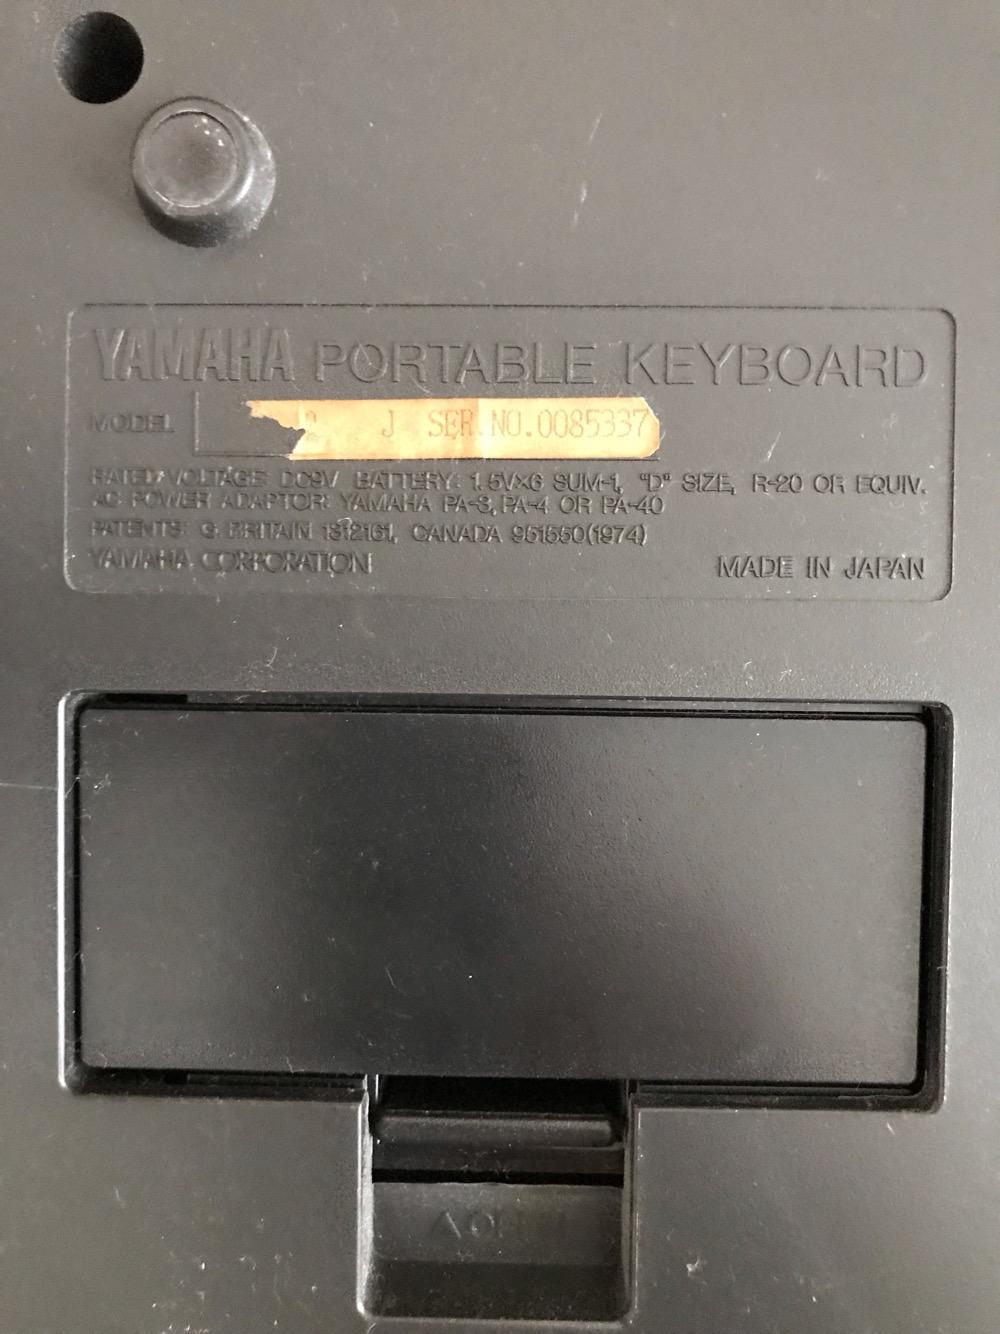 YAMAHA PORTATONE PSR-18の裏面のシリアルナンバーと乾電池の蓋